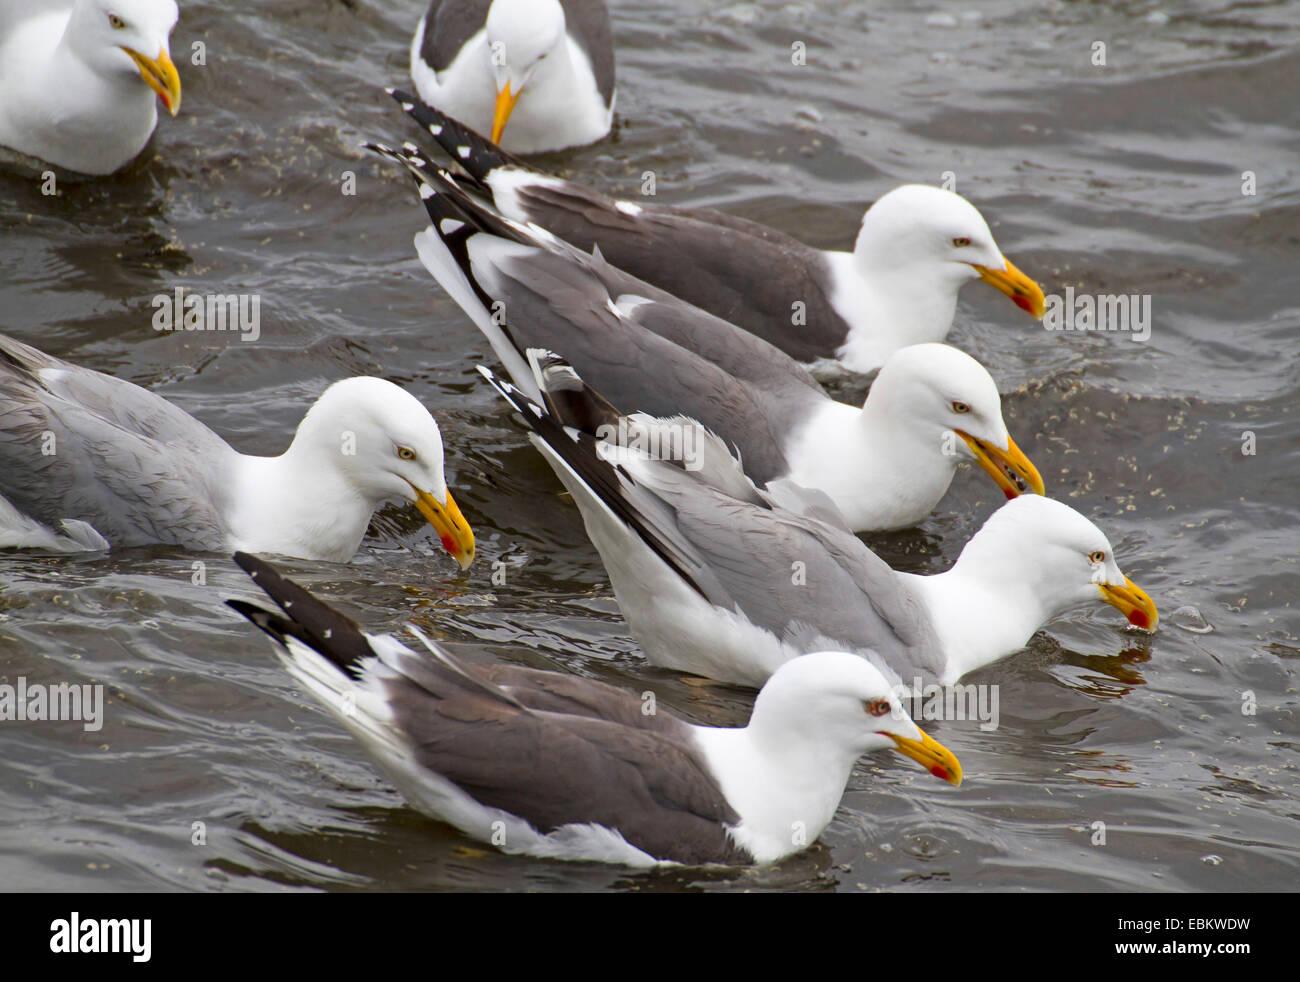 herring gull (Larus argentatus), herring gulls and lesser black-backed gulls swimming together, Europe, Germany, - Stock Image